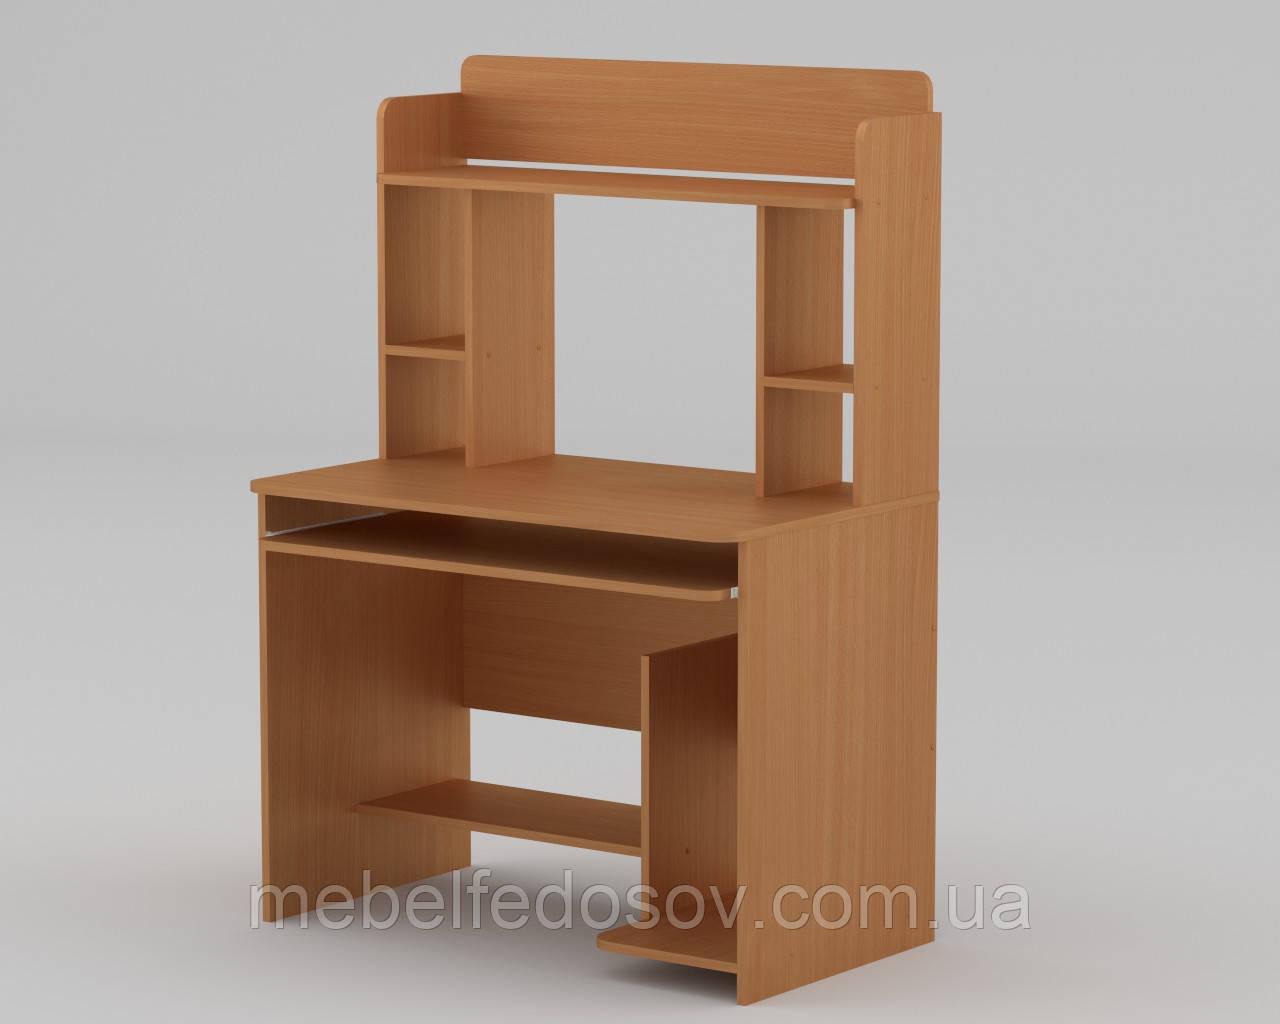 Стол компьютерный СКМ-6 (Компанит) 1000х598х756+686мм